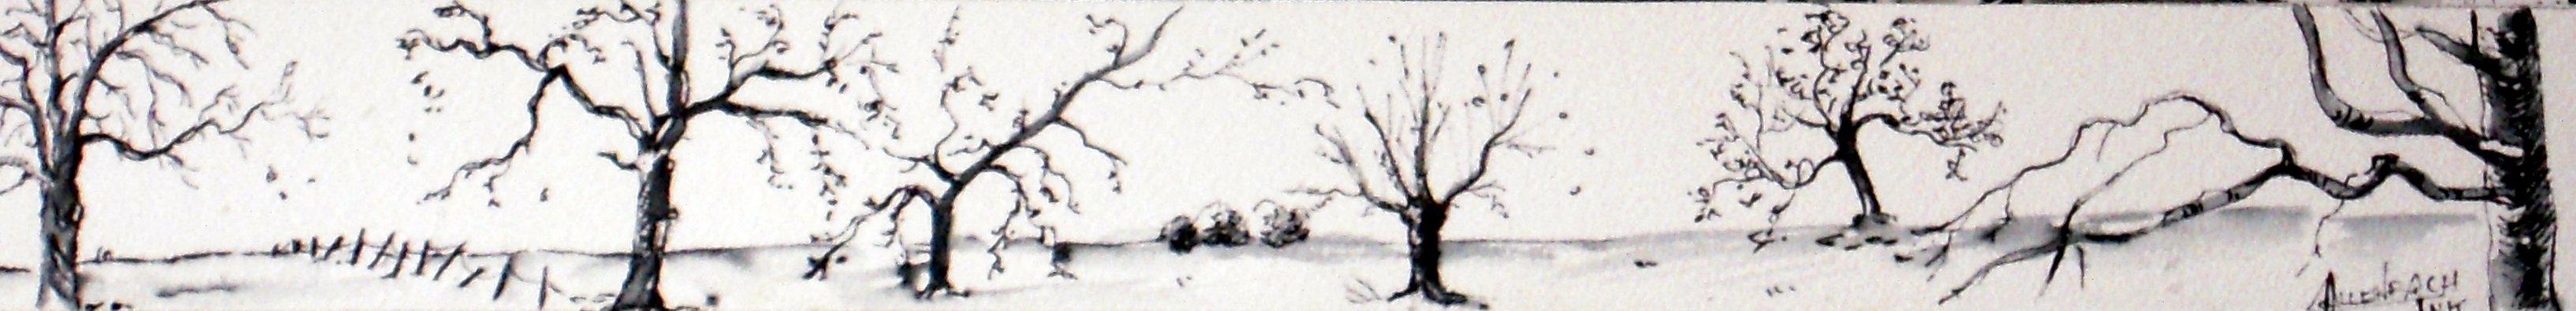 allenbach-chrisiane-desolation-oct